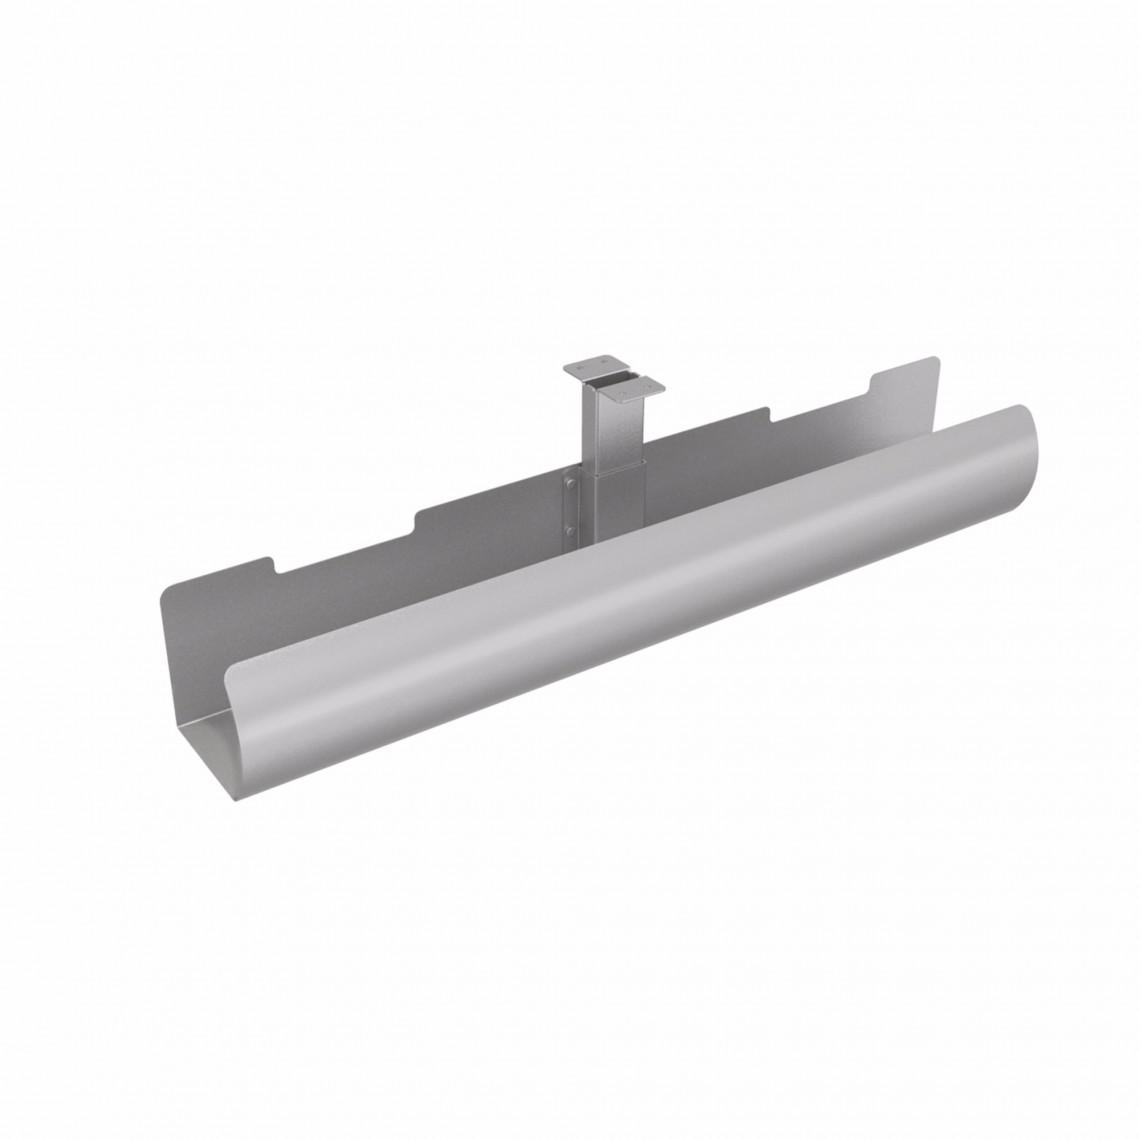 LiftPipe Kabelrör - 650 mm, Silver